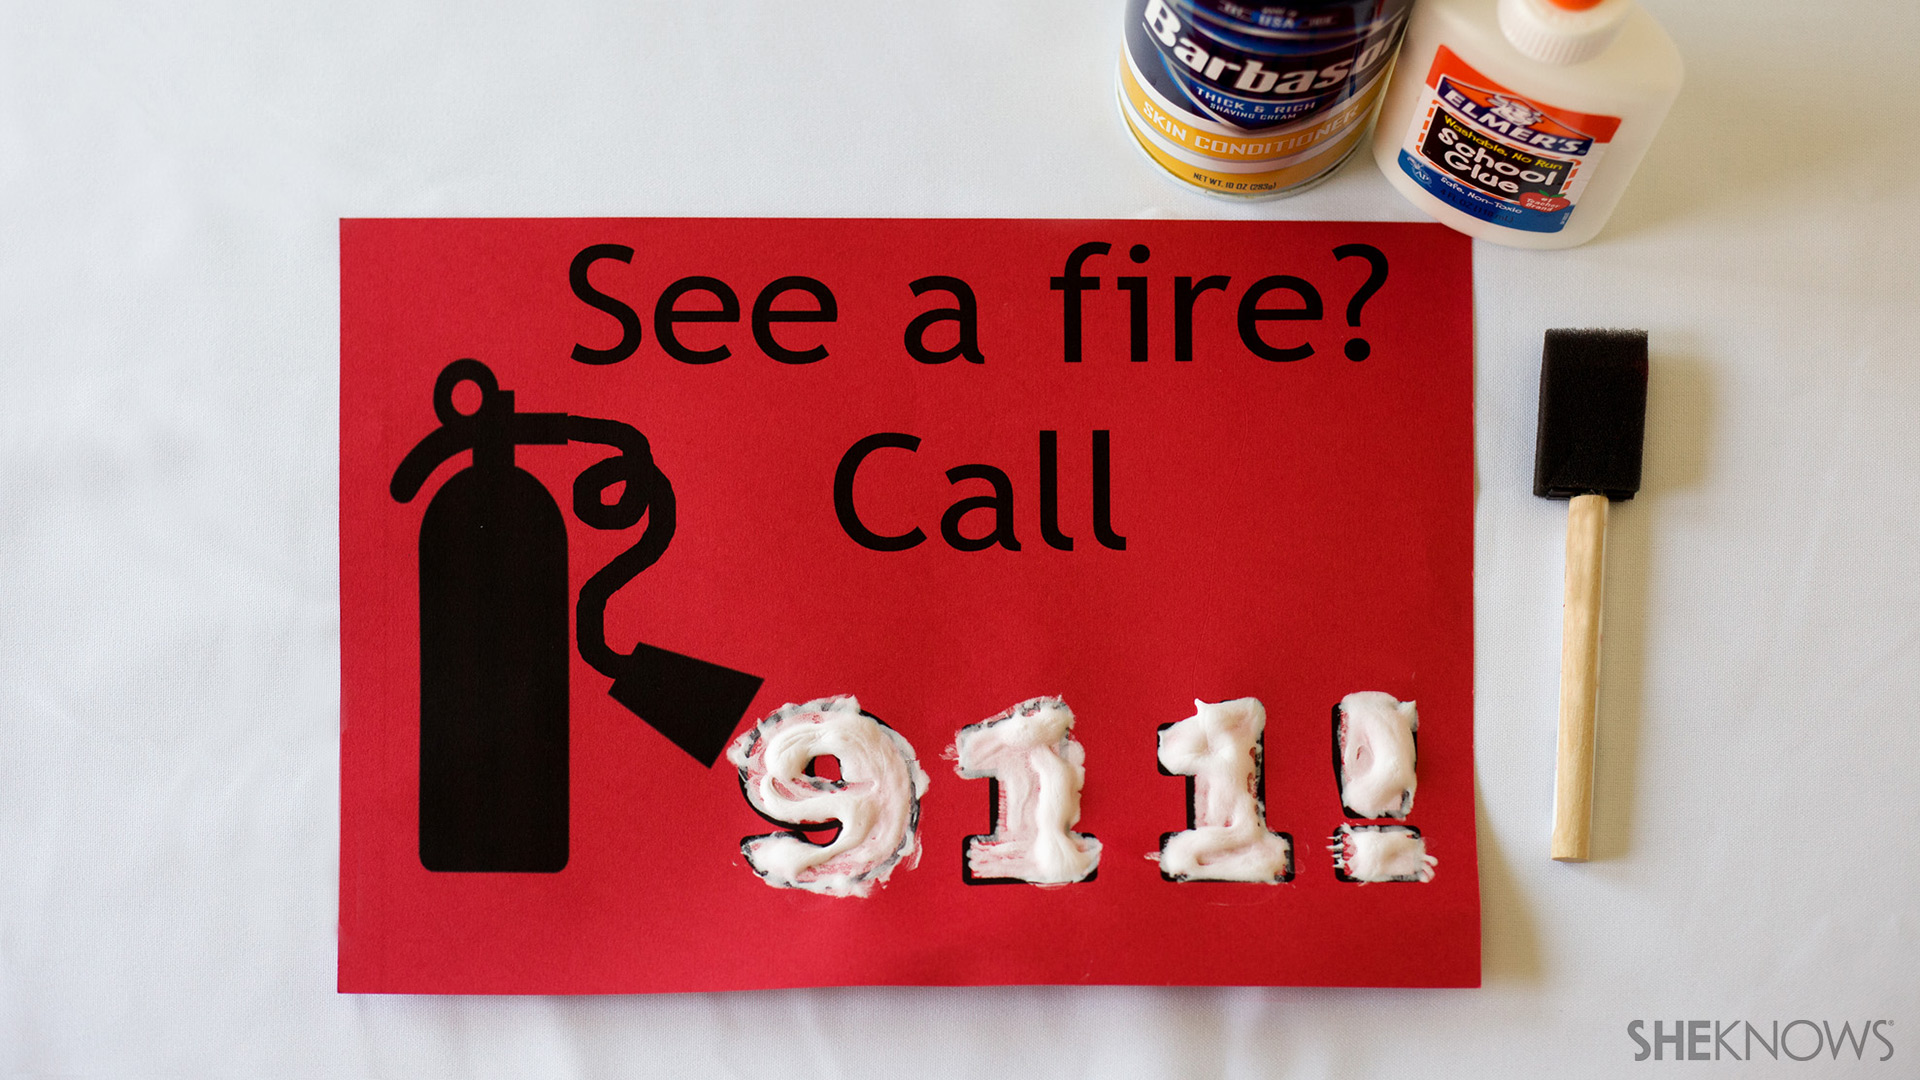 Fire extinguisher craft | Sheknows.com